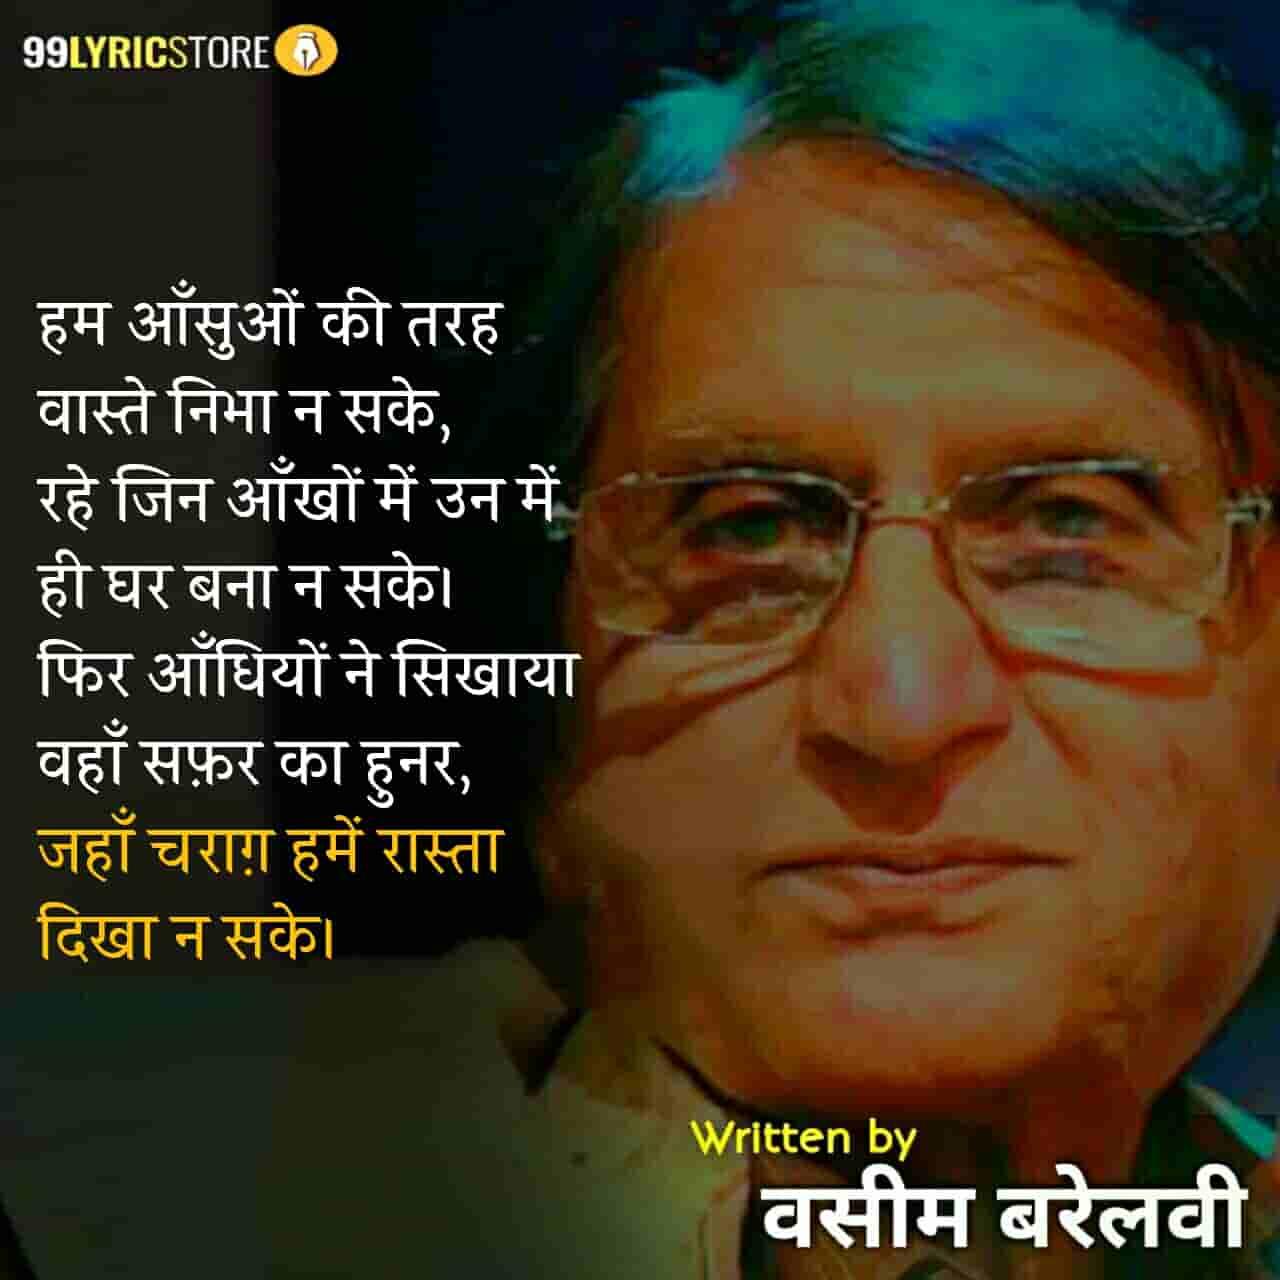 This beautiful Ghazal 'Hum Apne Aap Ko Ek Masla Bana Na Sake' has written by Waseem Barelvi.